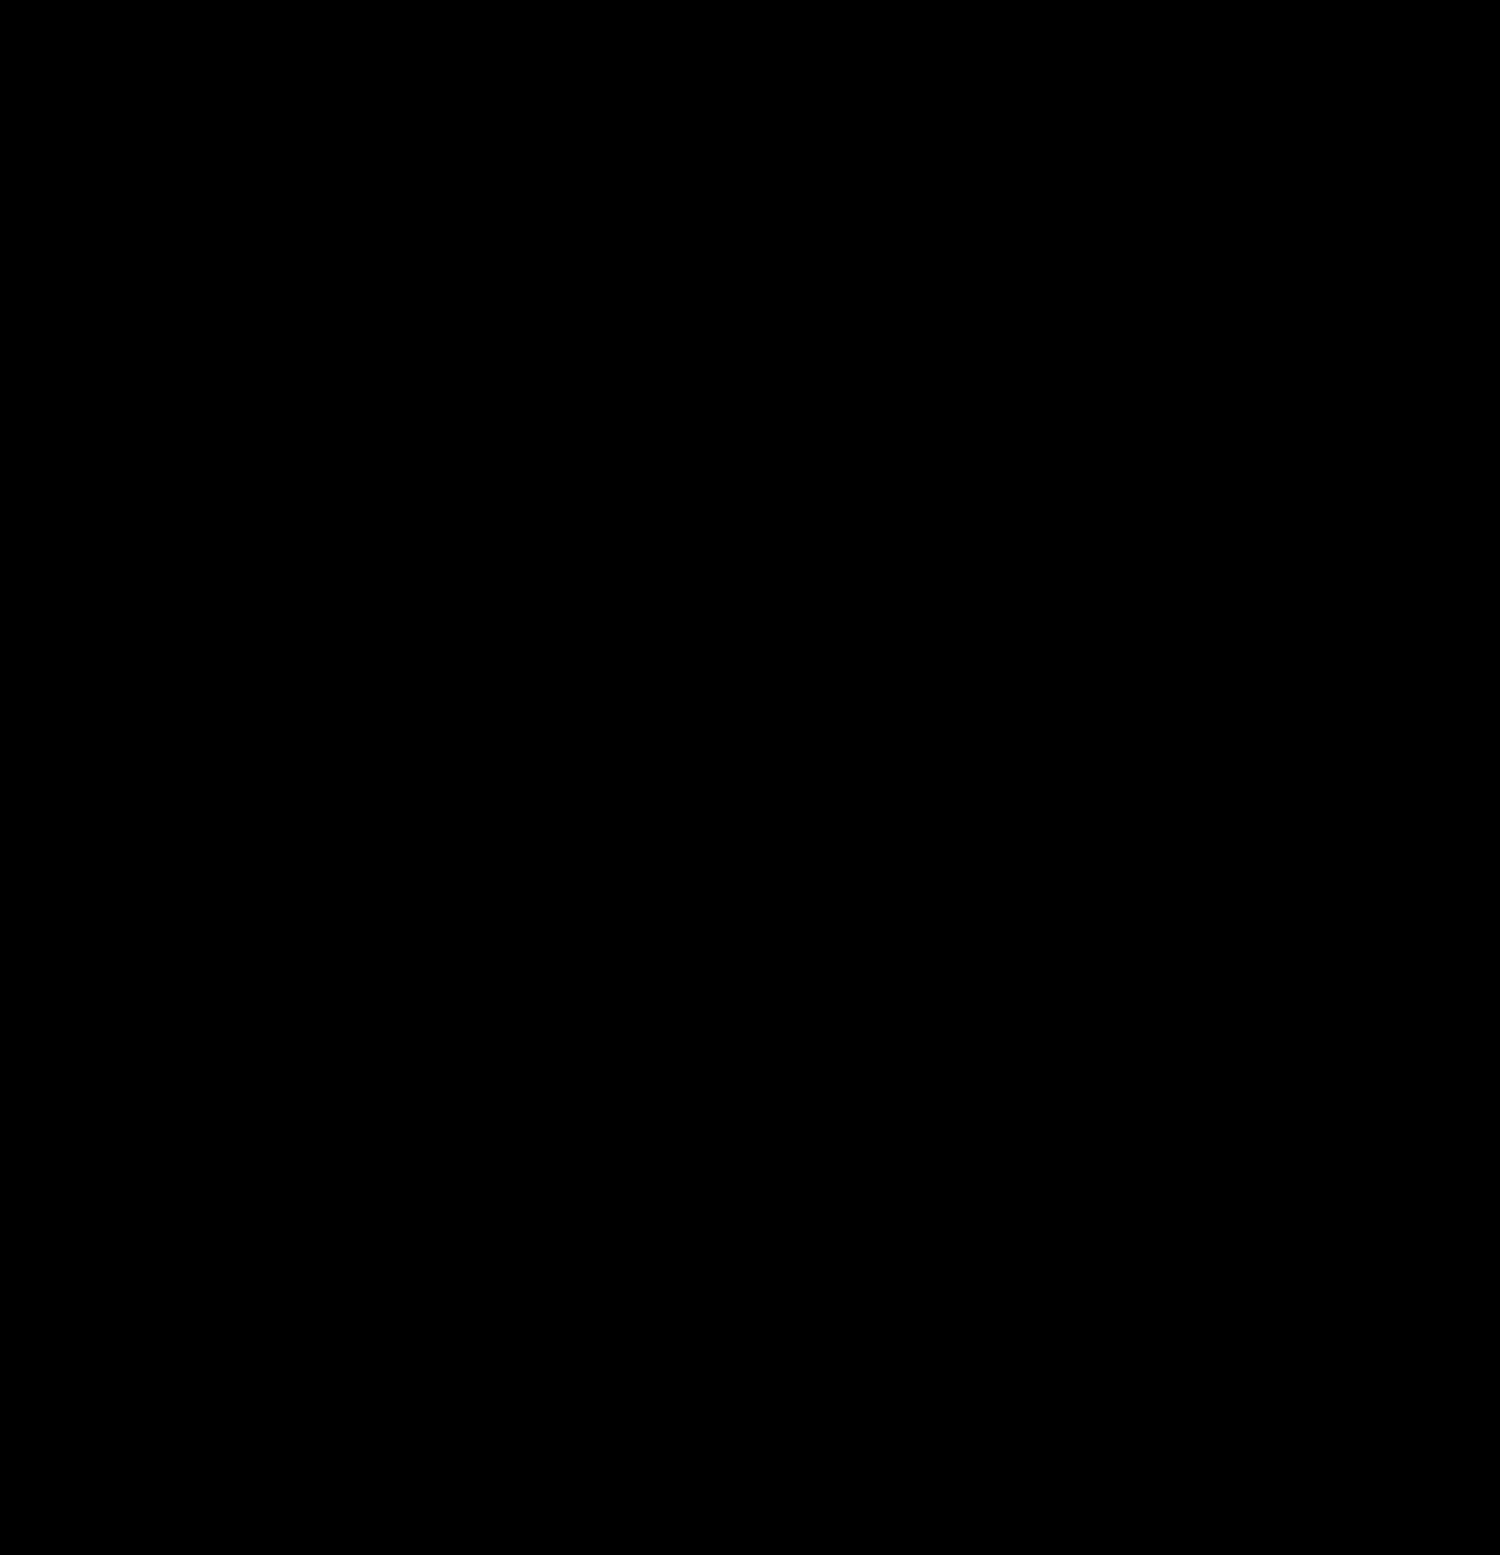 Biota Fermentation Botanical Illustration Logo — by Dima Yagnyuk.